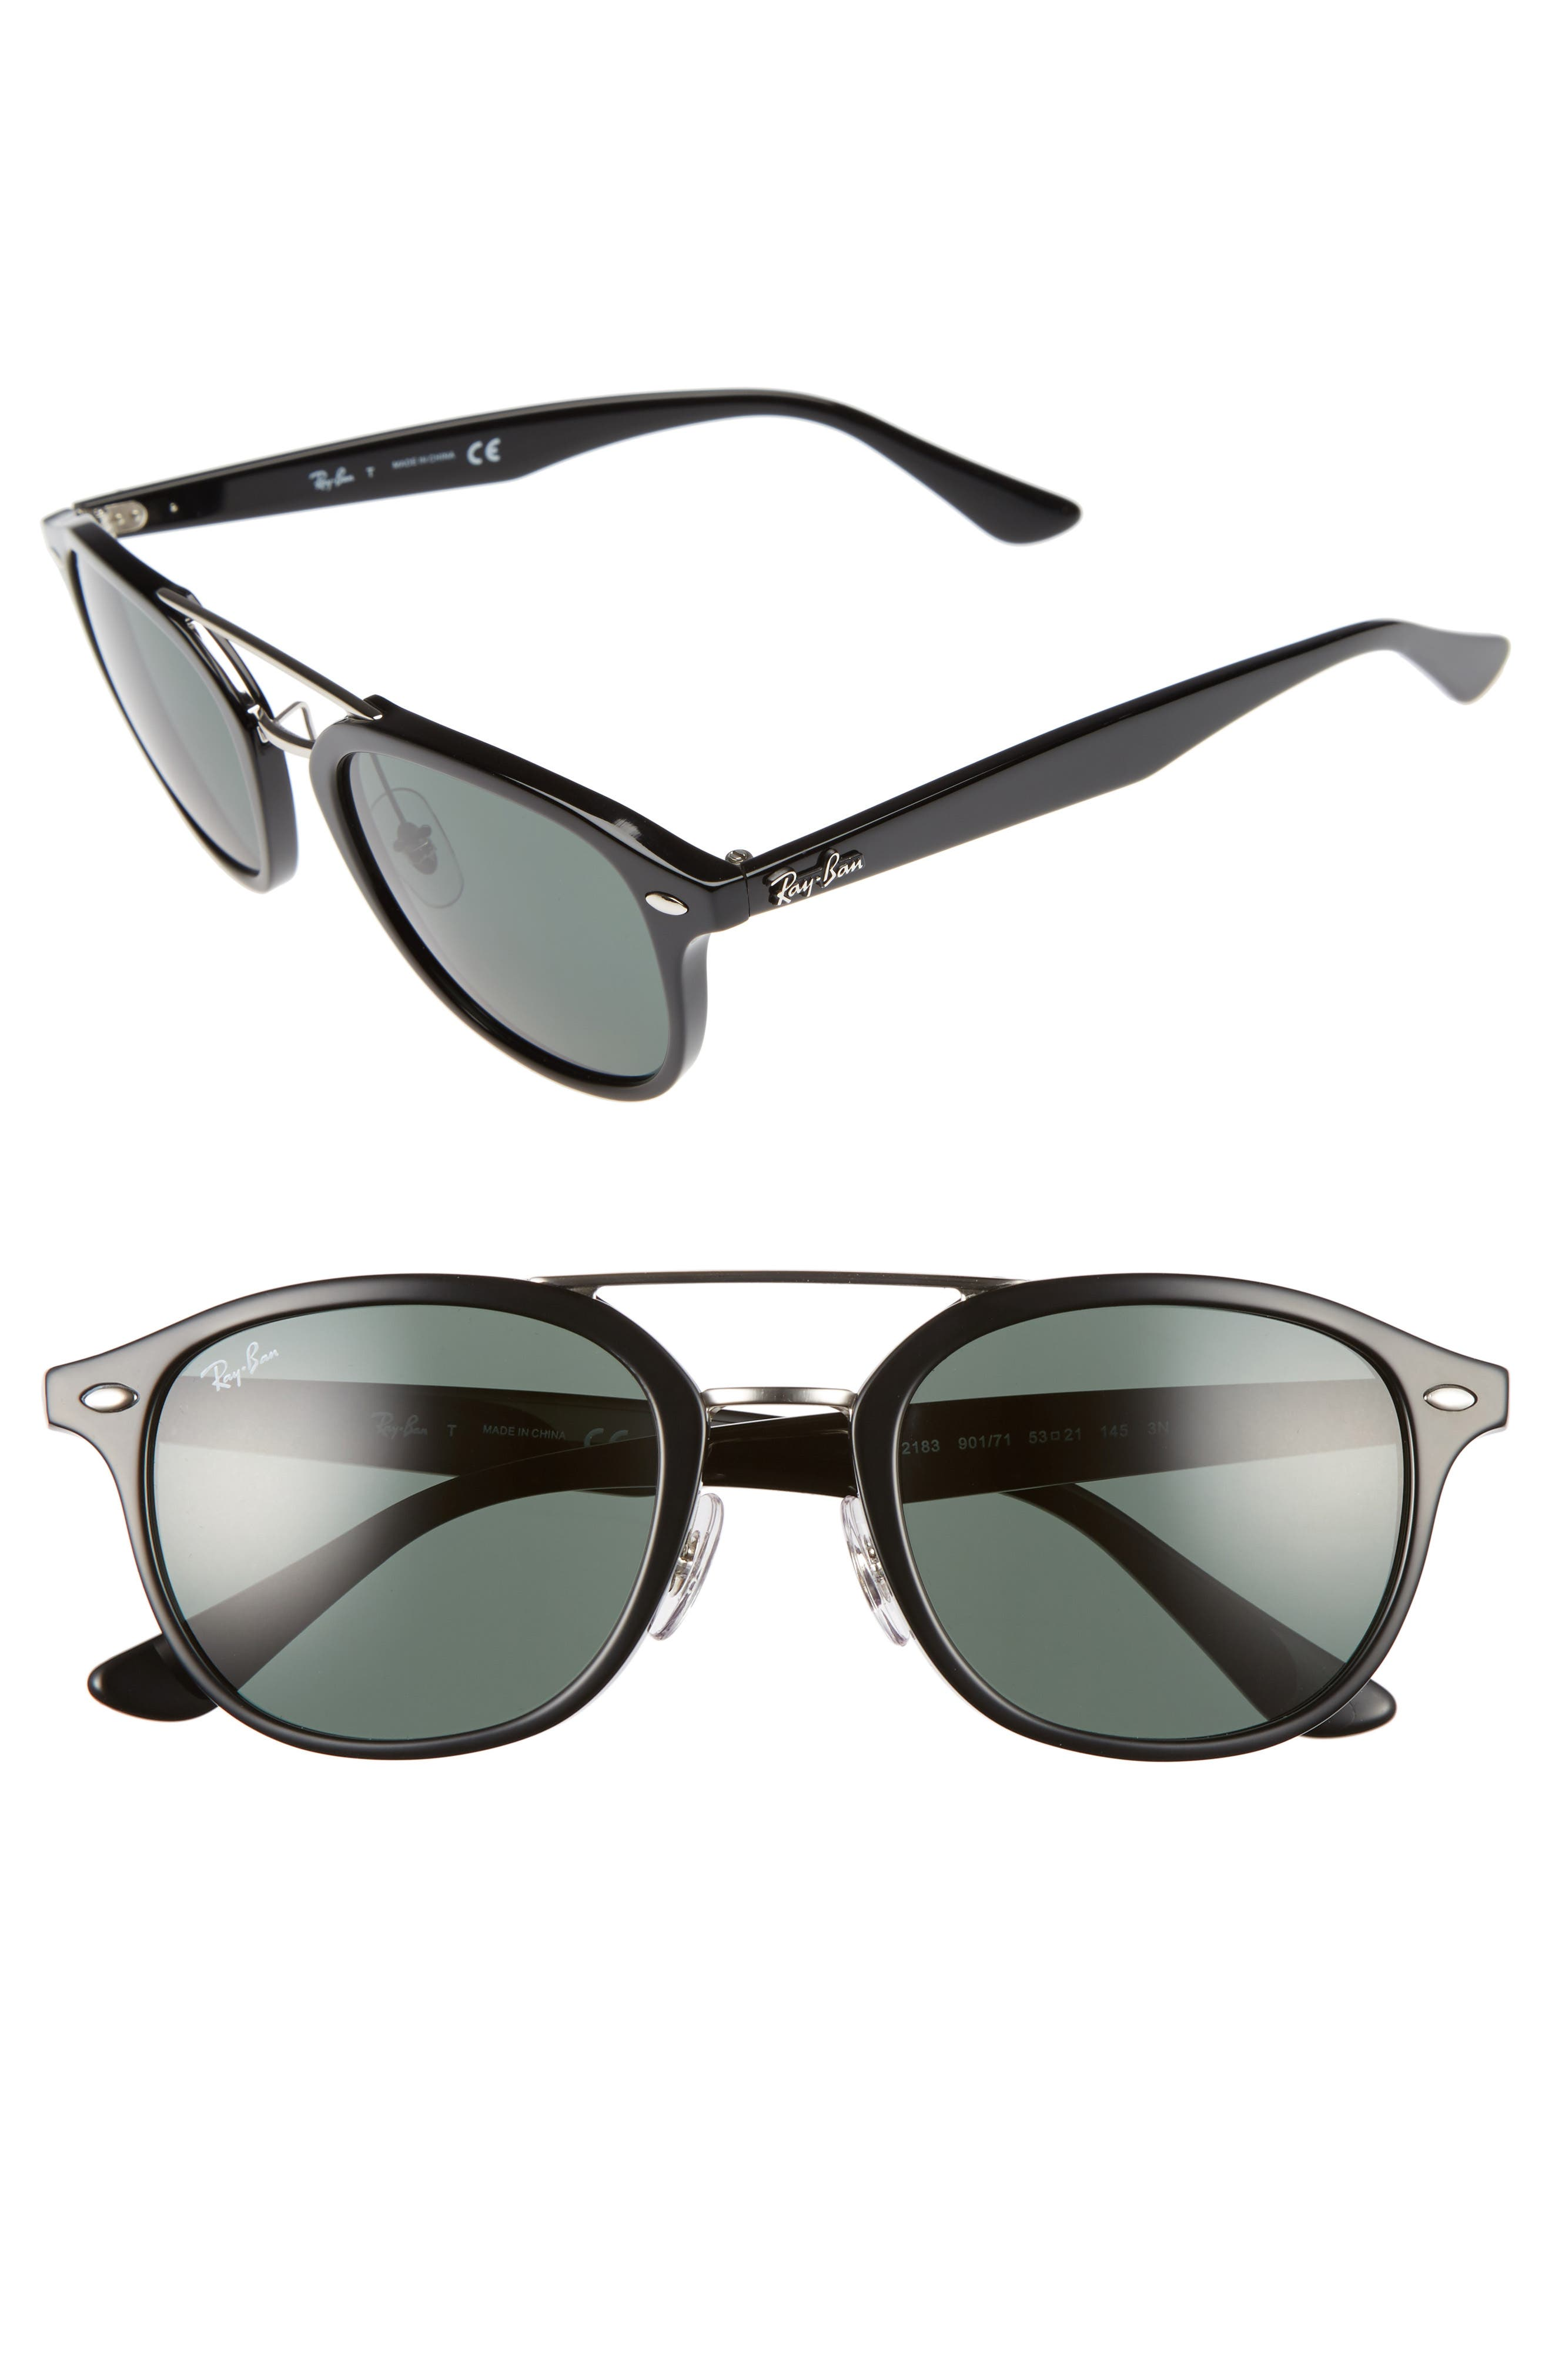 Ray-Ban Highstreet 53mm Sunglasses